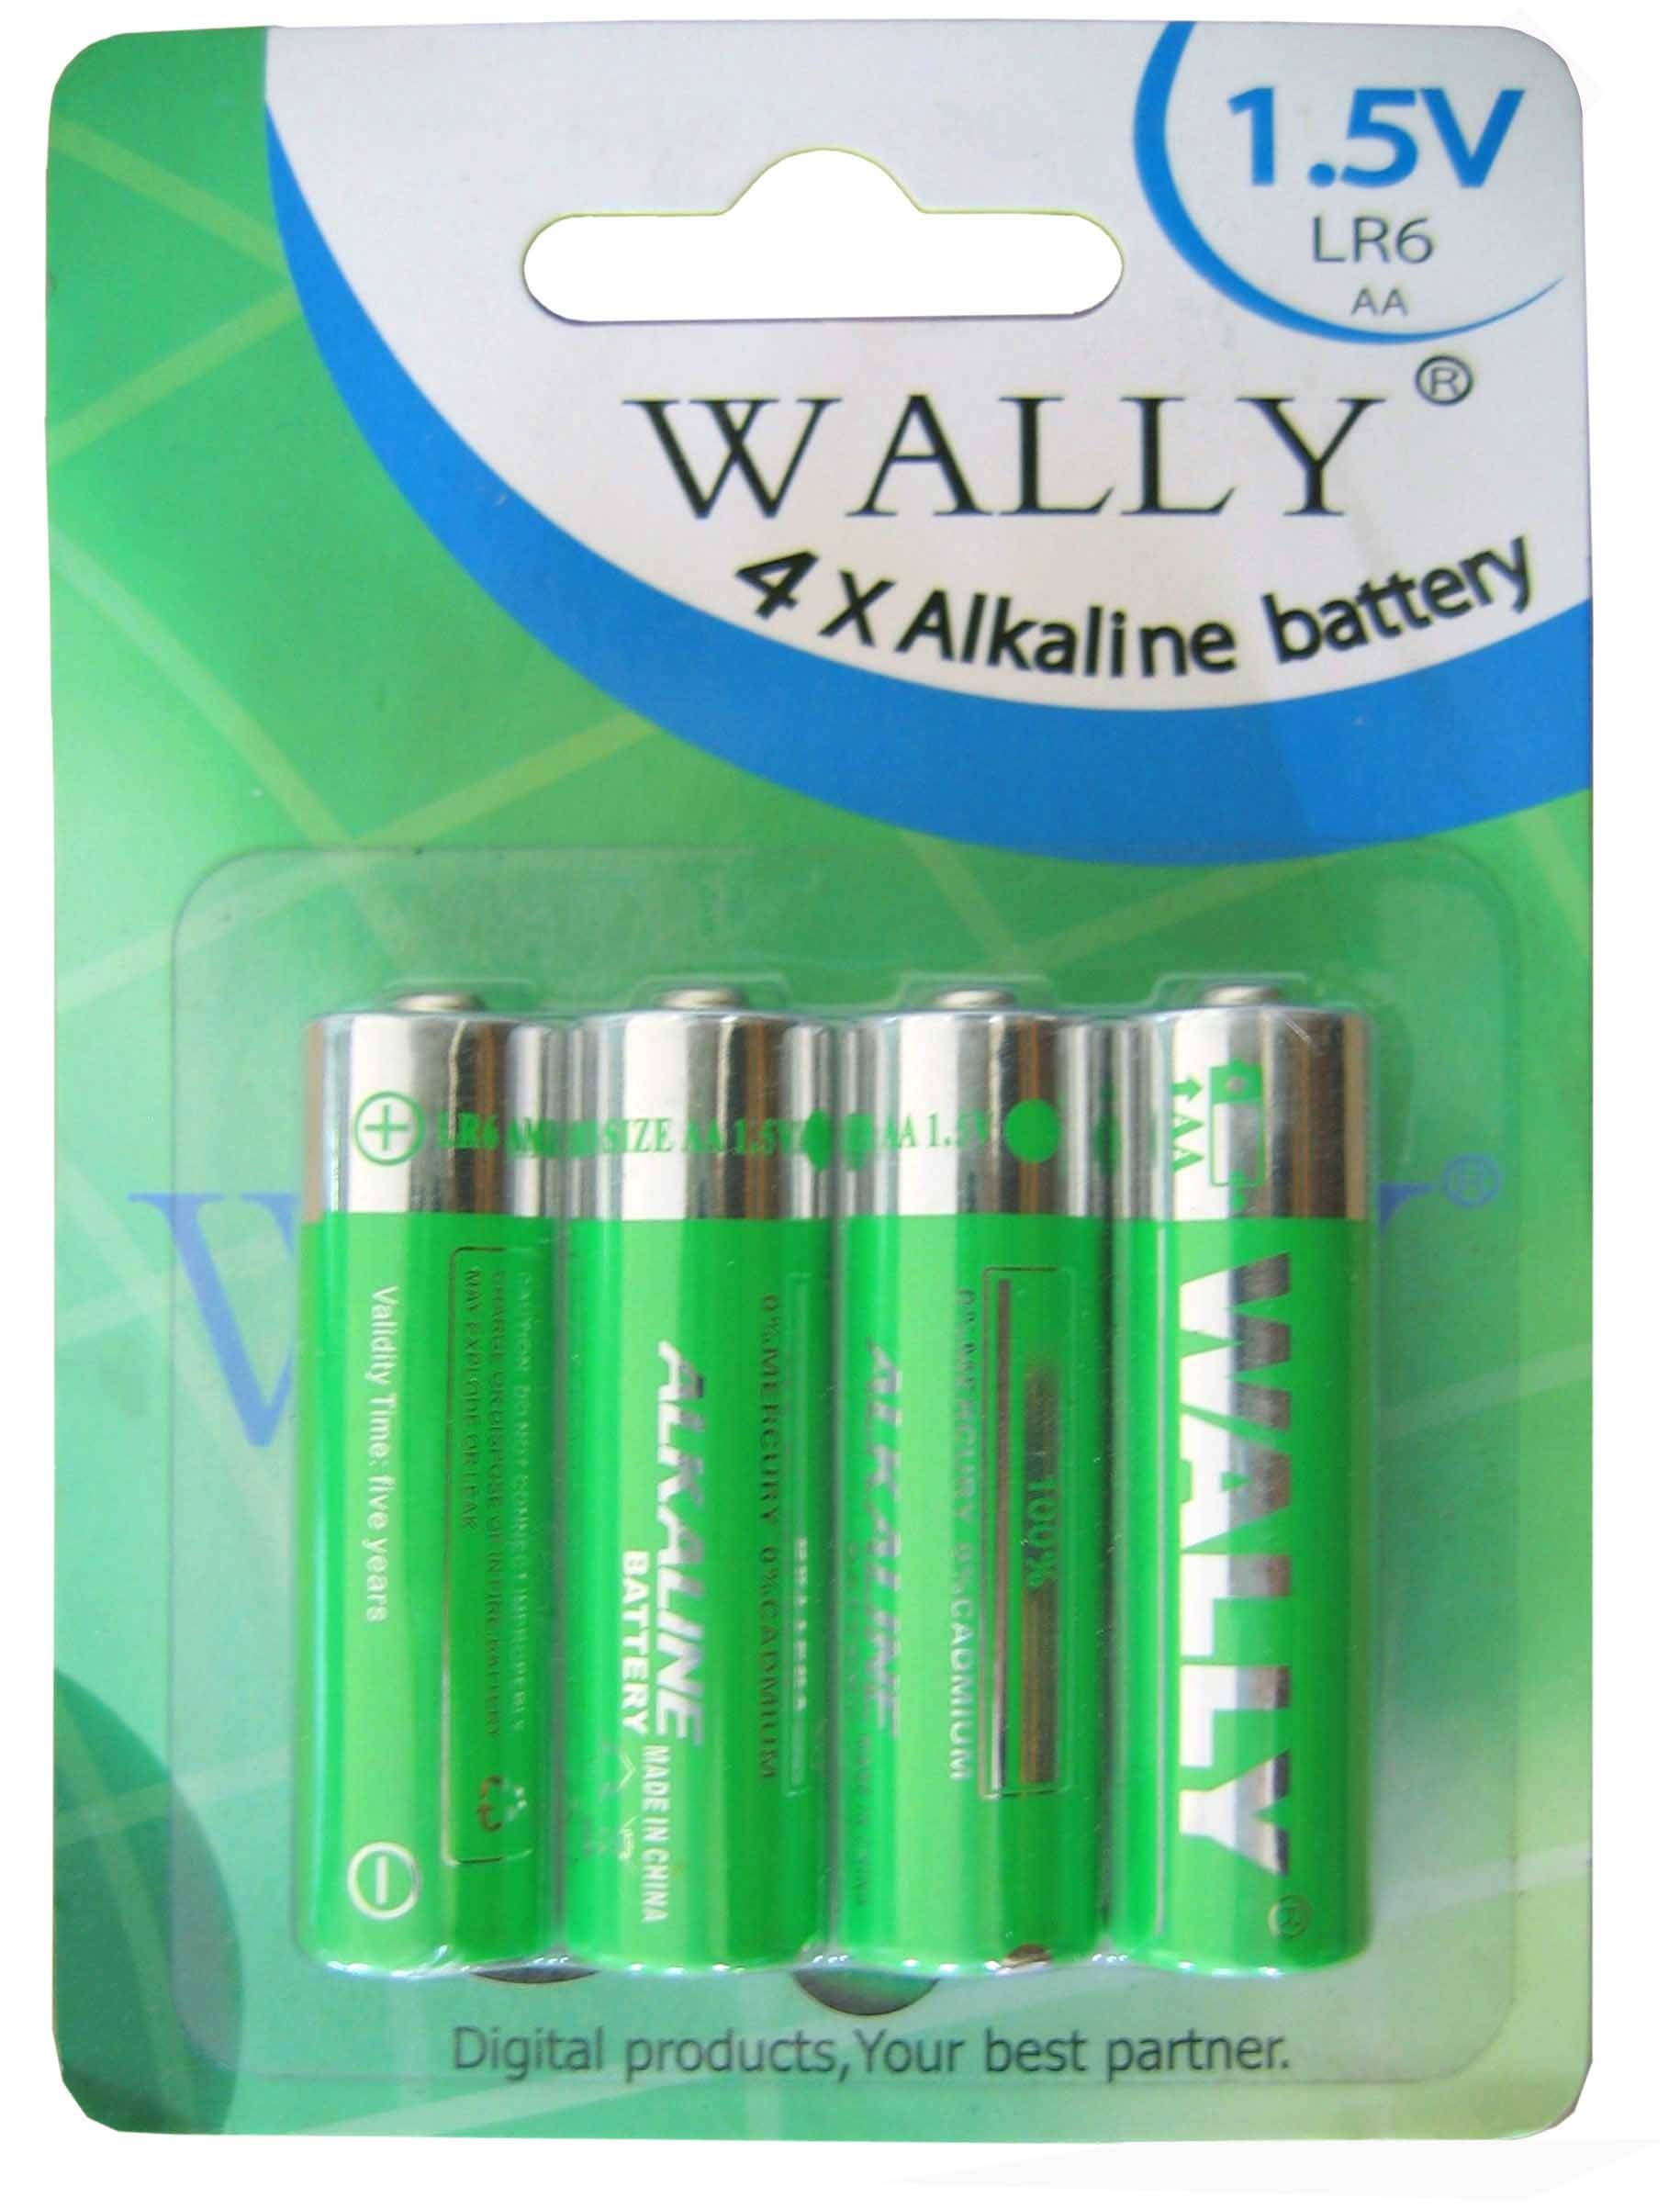 AA AAA carbon battery R20